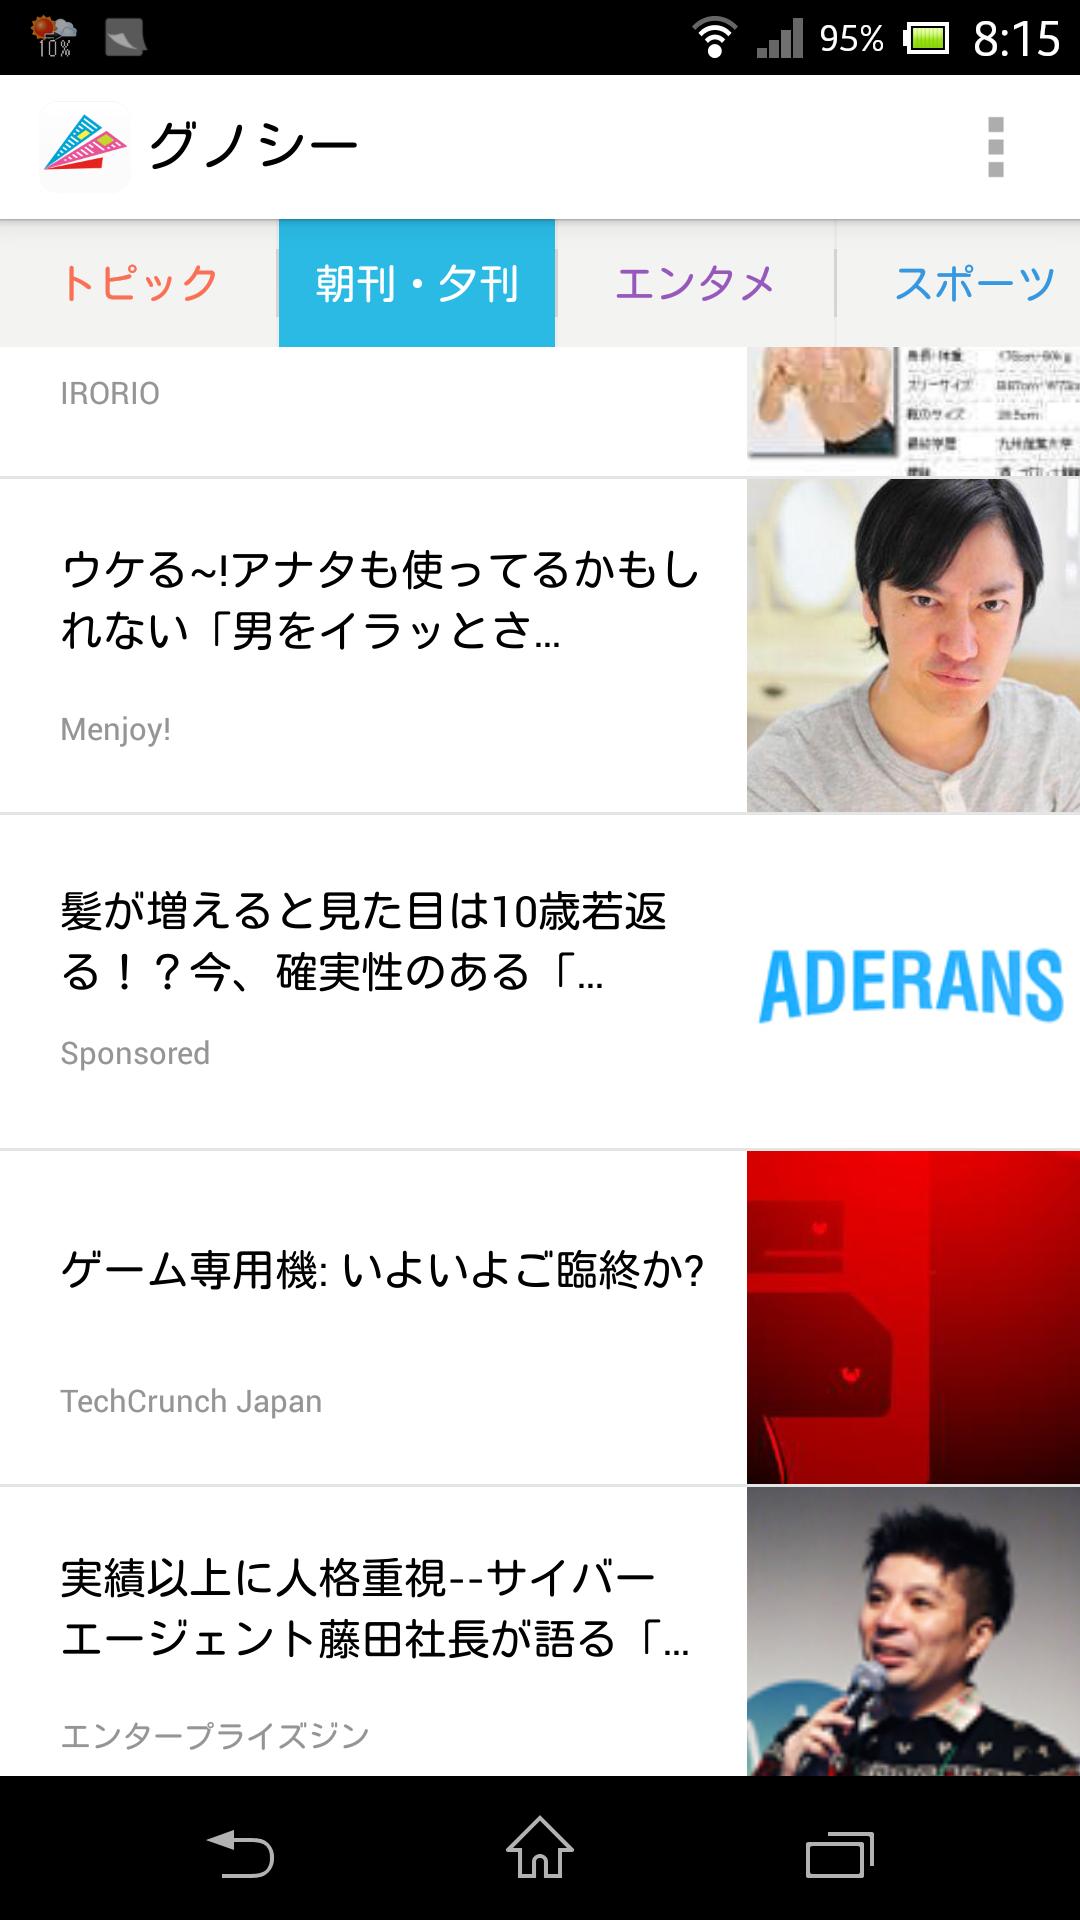 http://blogs.bizmakoto.jp/toppakoh/Screenshot_2014-03-12-08-15-43.png